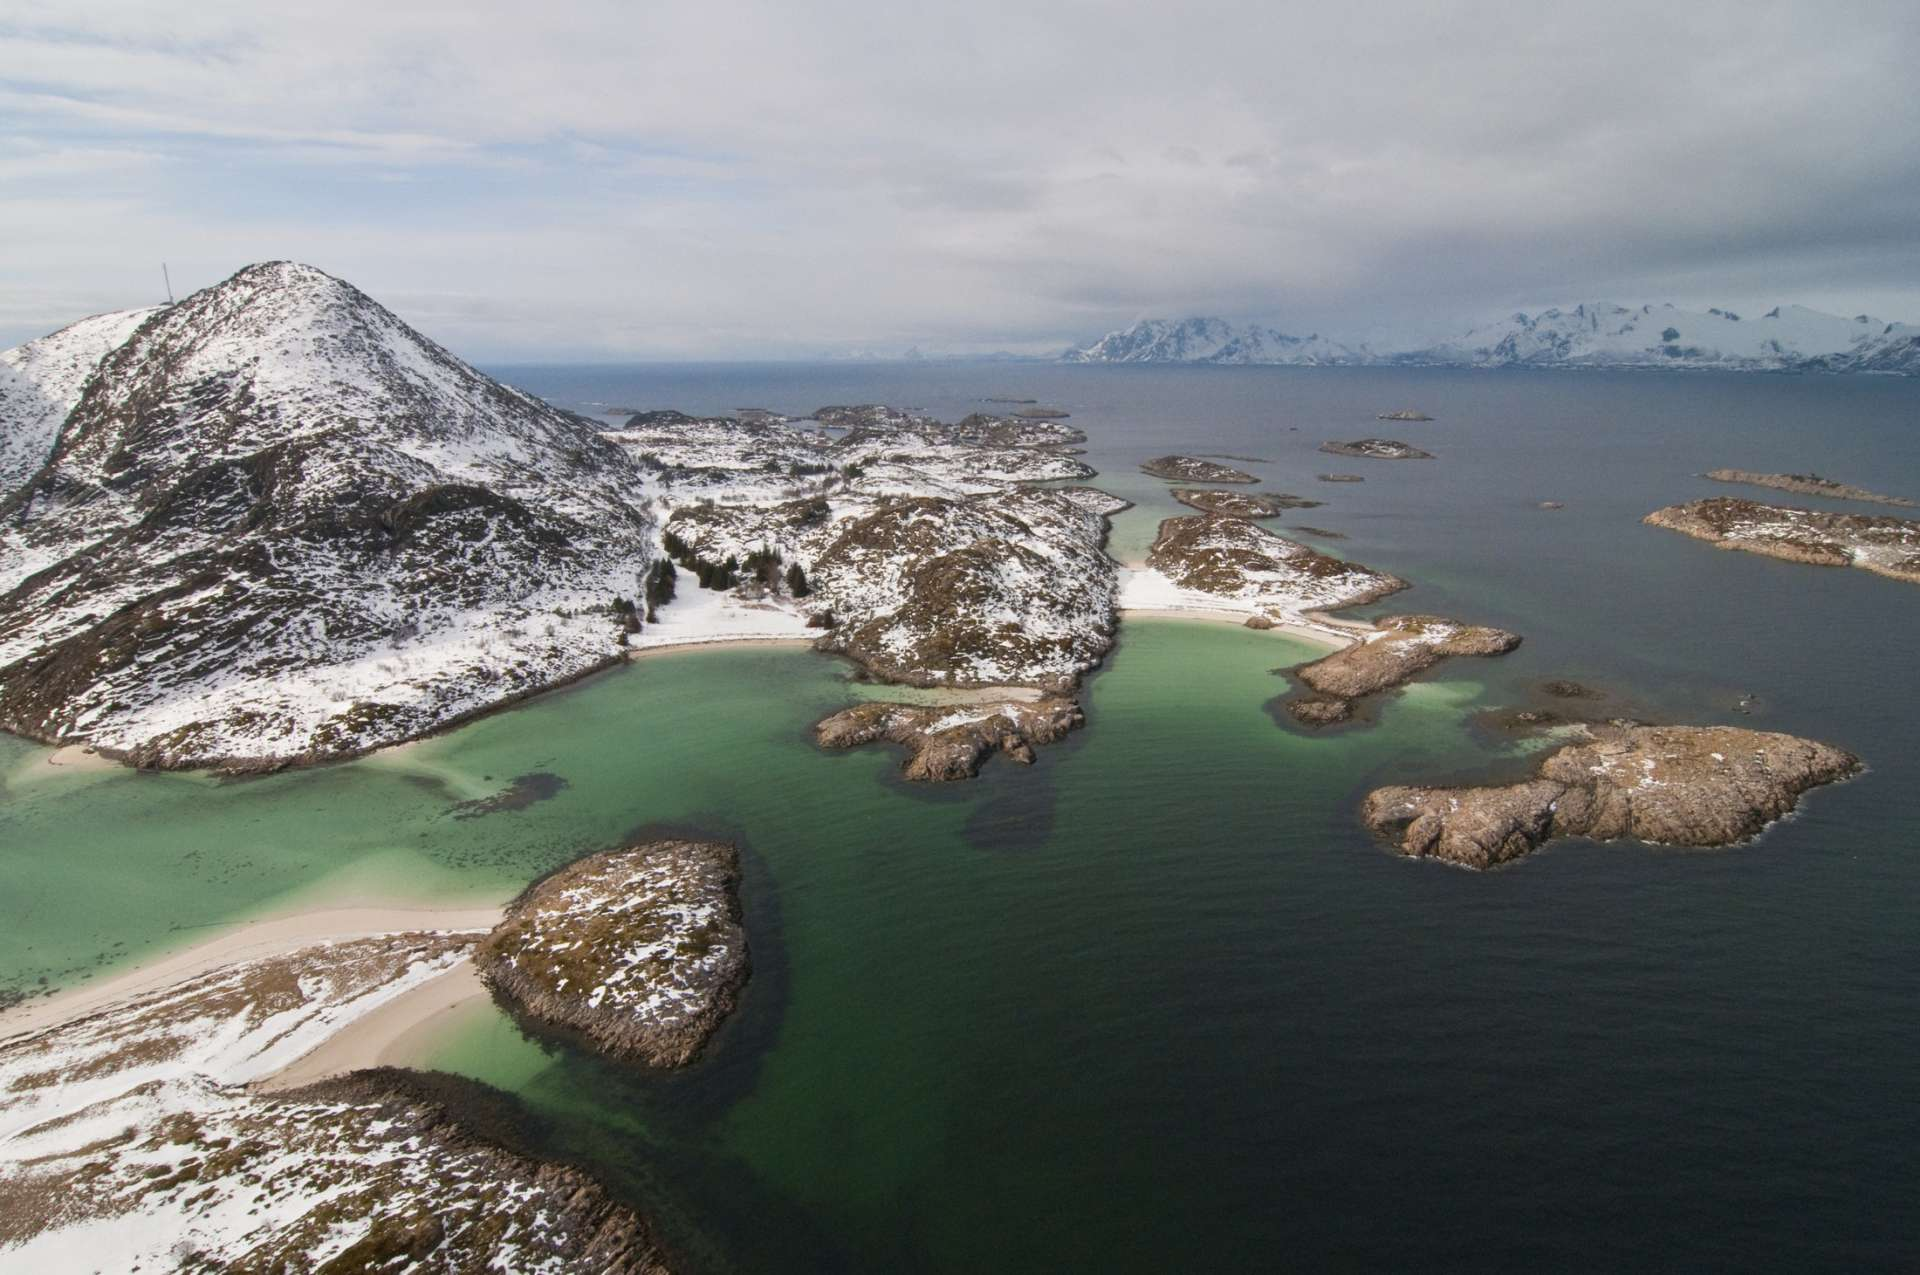 Norvège - Iles Lofoten - Iles Lofoten - Vue Aerienne